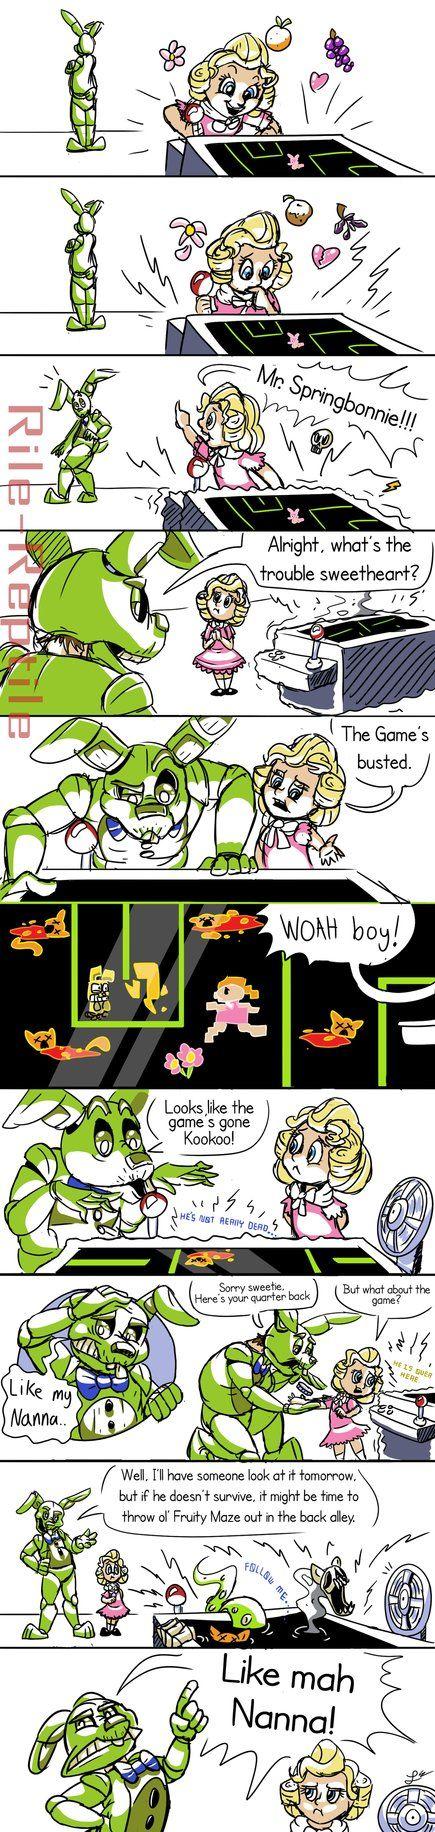 Fnaf 6 mini comic: Fruits on the Fritz by Rile-Reptile.deviantart.com on @DeviantArt